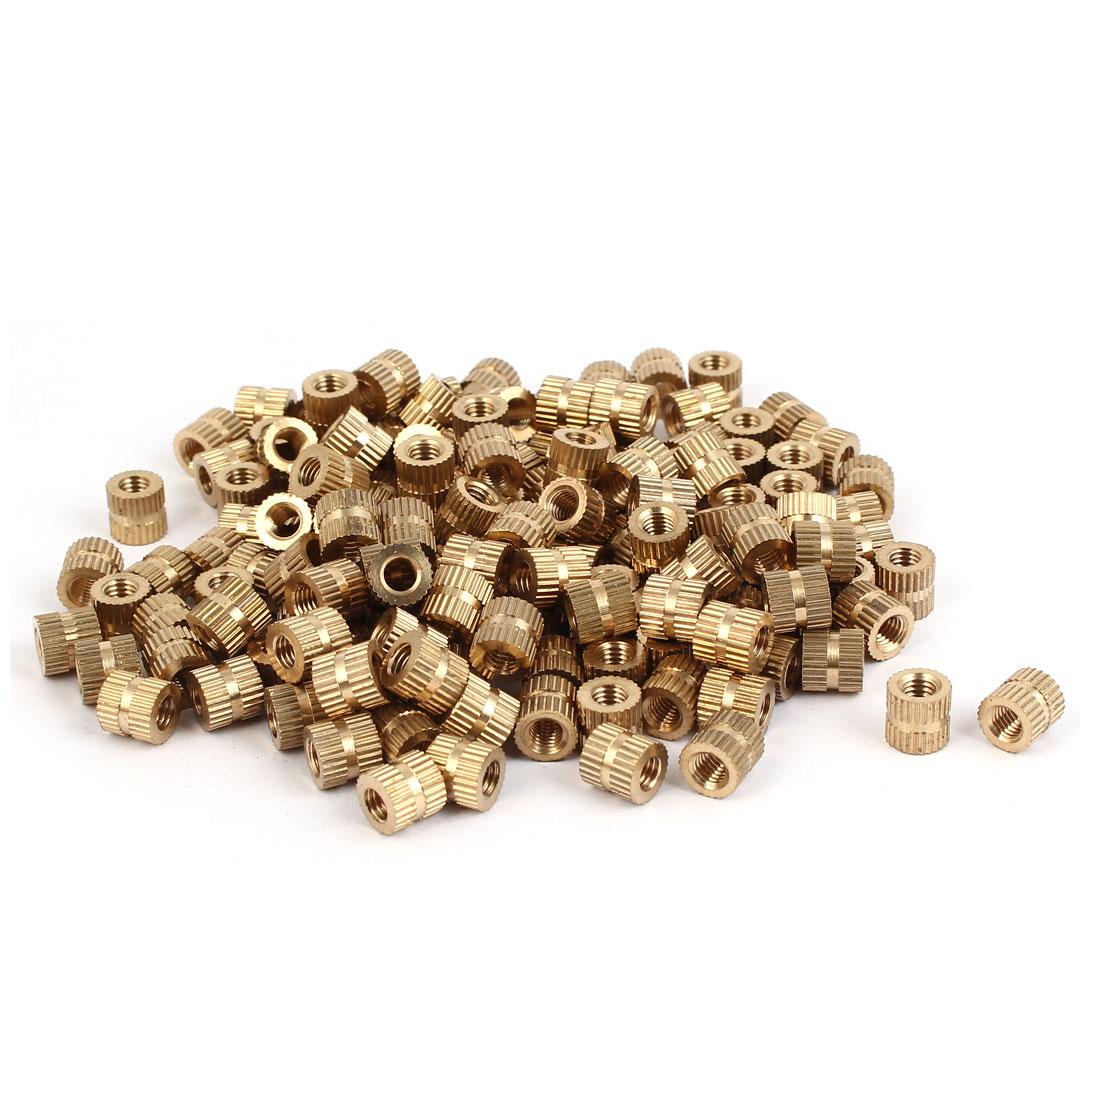 M5 x 8mm Brass Cylinder Knurled Threaded Round Insert Embedded Nuts 200PCS